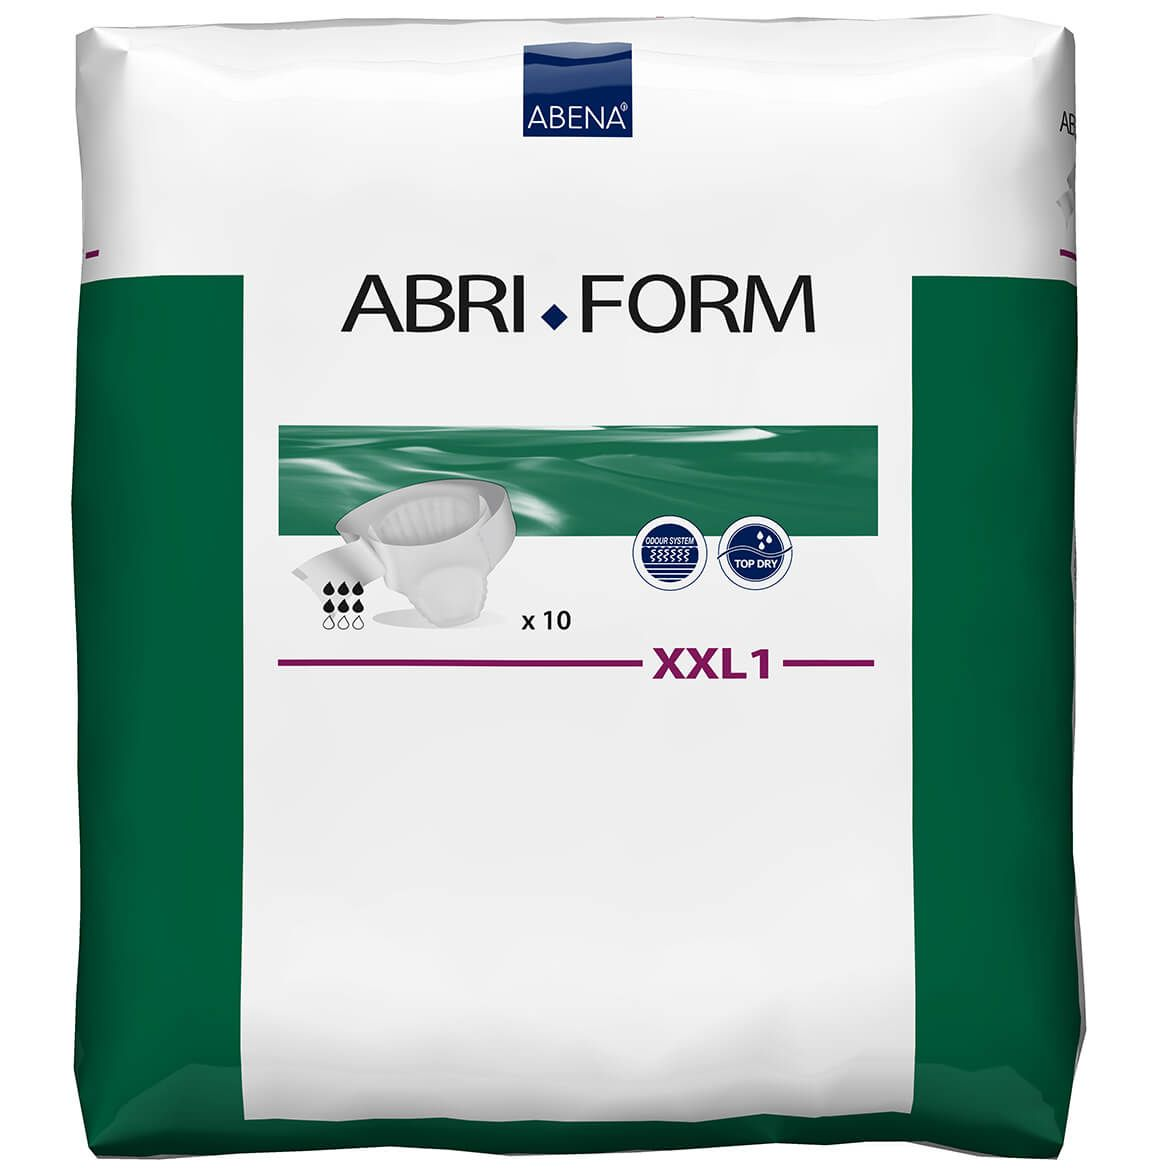 Abri-Form™ 76oz. Premium Adult Briefs 2XL, Case of 40-368456